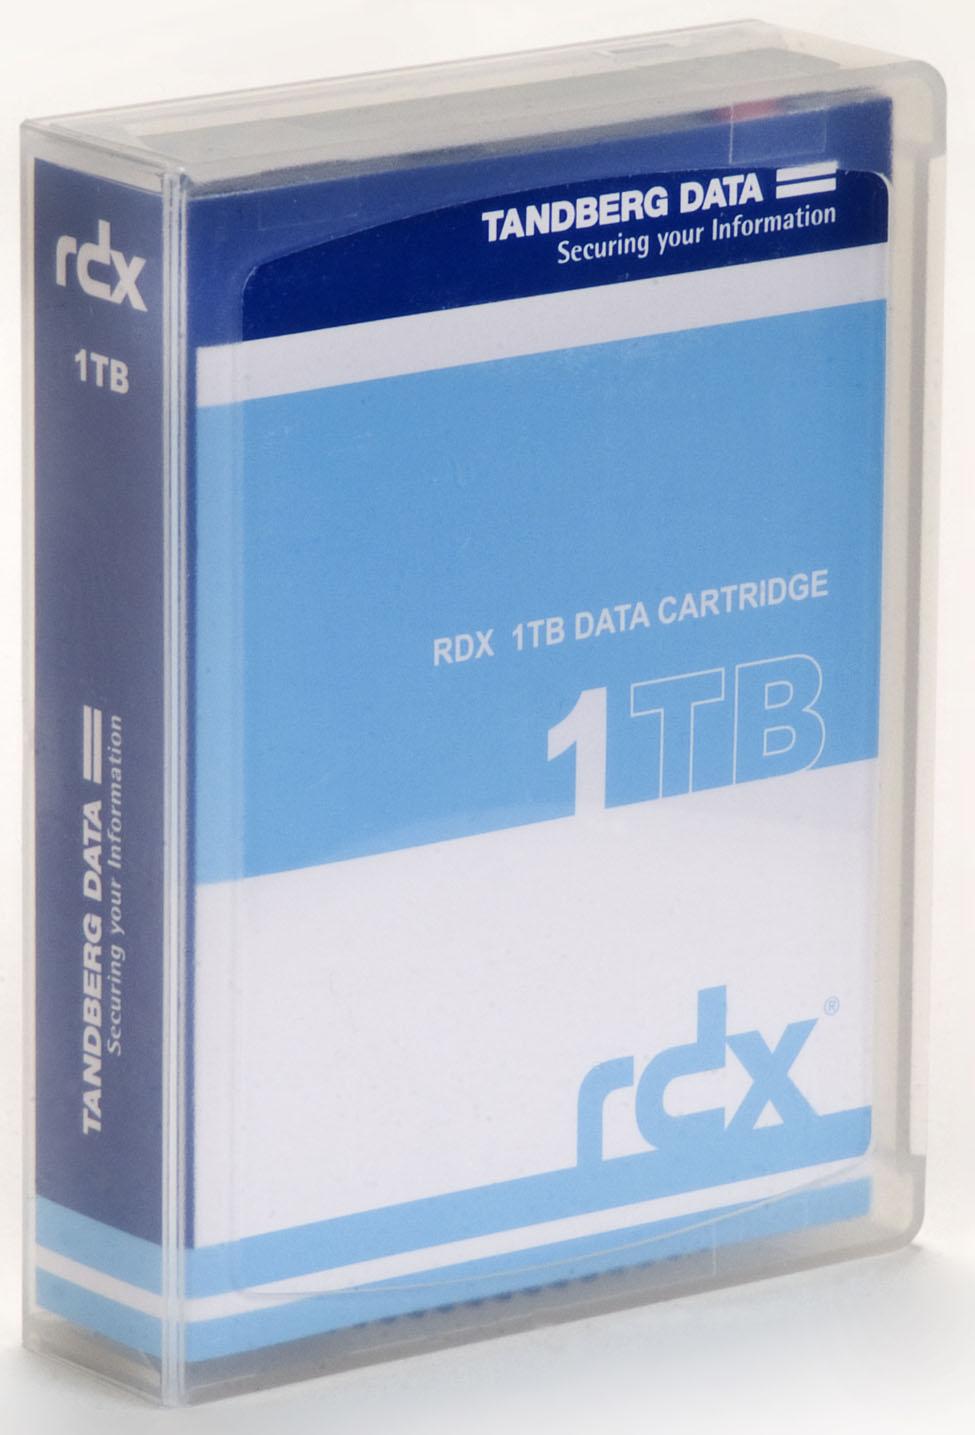 Removable Disk Based Backup Storage Quantum Rdx Imation Hp Wd Wdbbkd0030 3tb Hard Cartridge Tandberg Data 1tb 10 Pack X